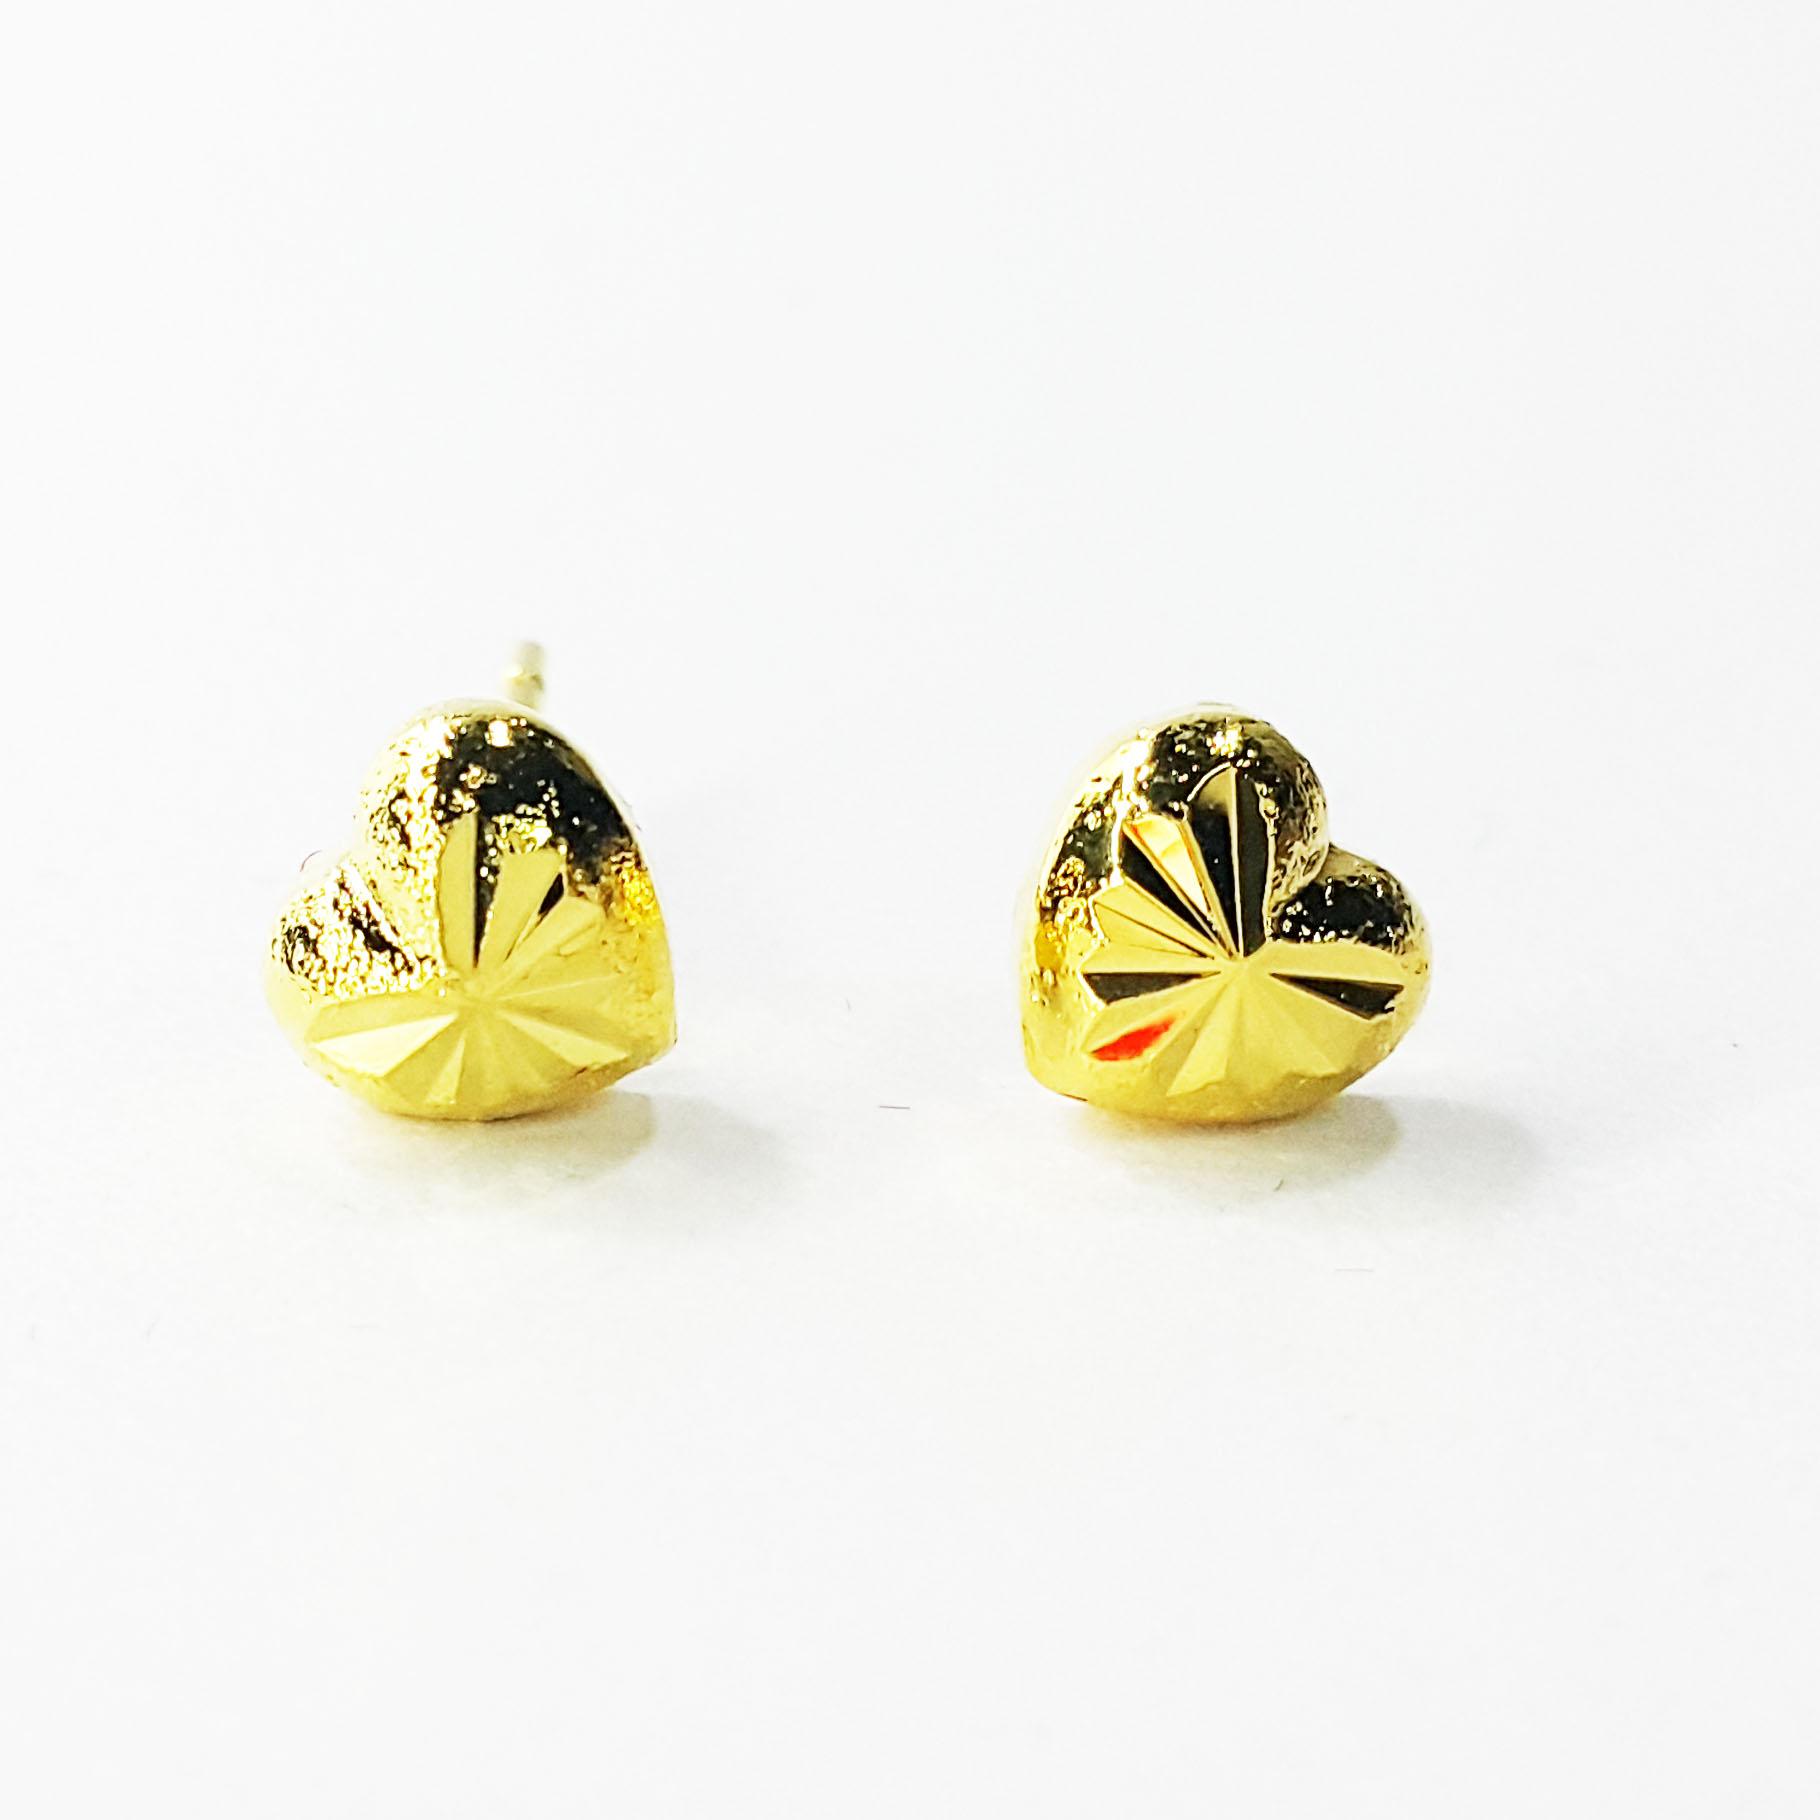 Inspire Jewelry ต่างหูรูปหัวใจตอกลาย หุ้มทองแท้ 100% 24K size M